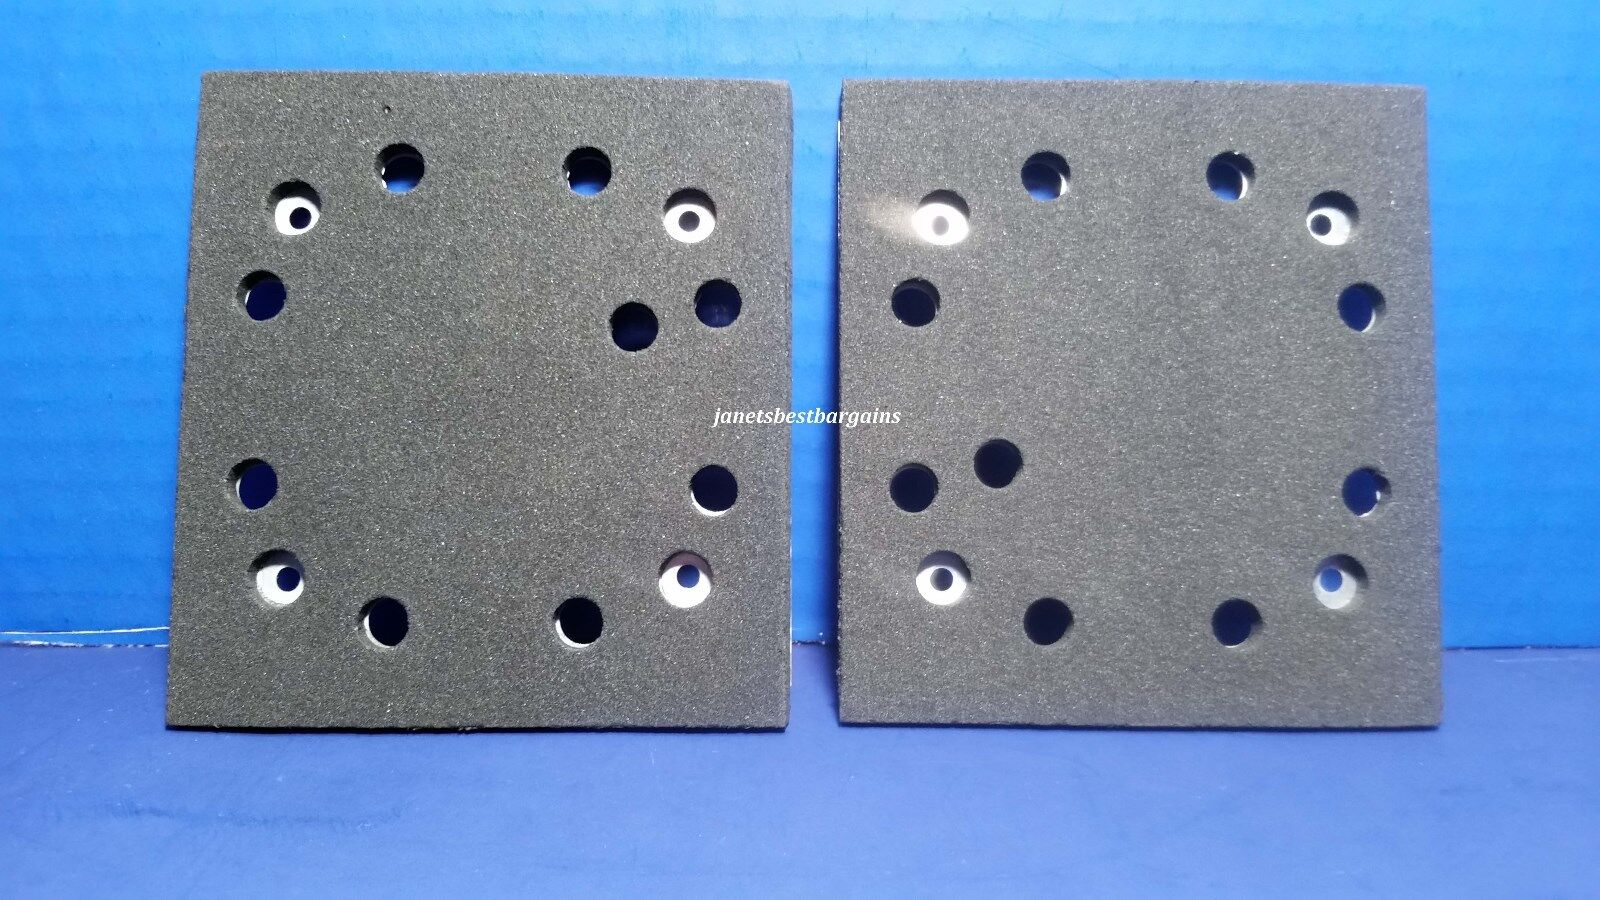 Square sanding pads water based polyurethane floor finish